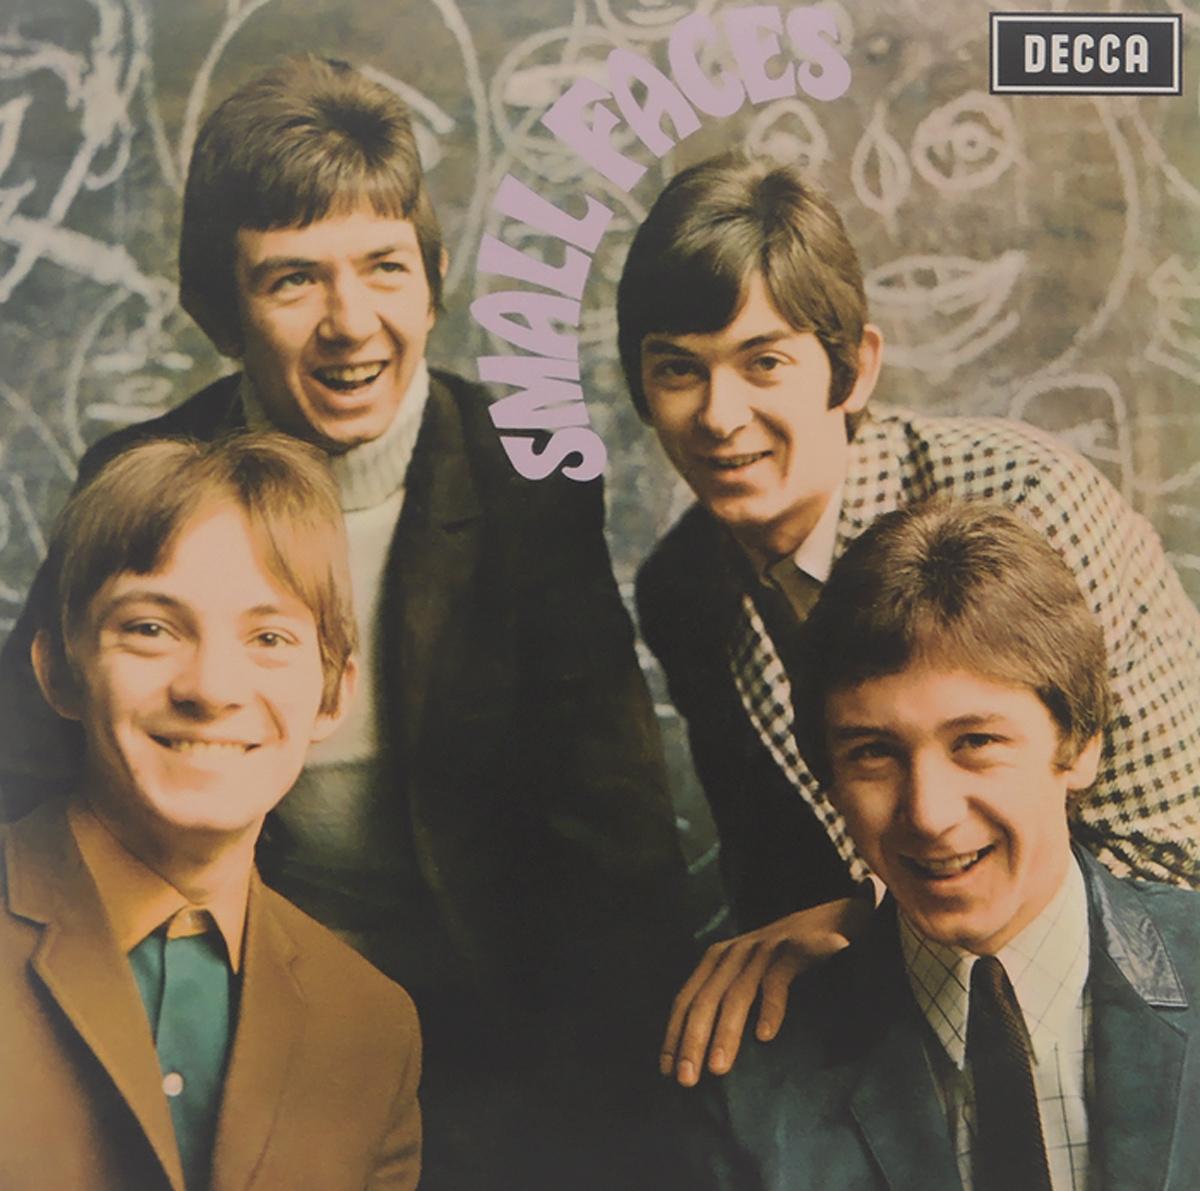 The Small Faces Small Faces. Small Faces (LP) 爆笑大百科1